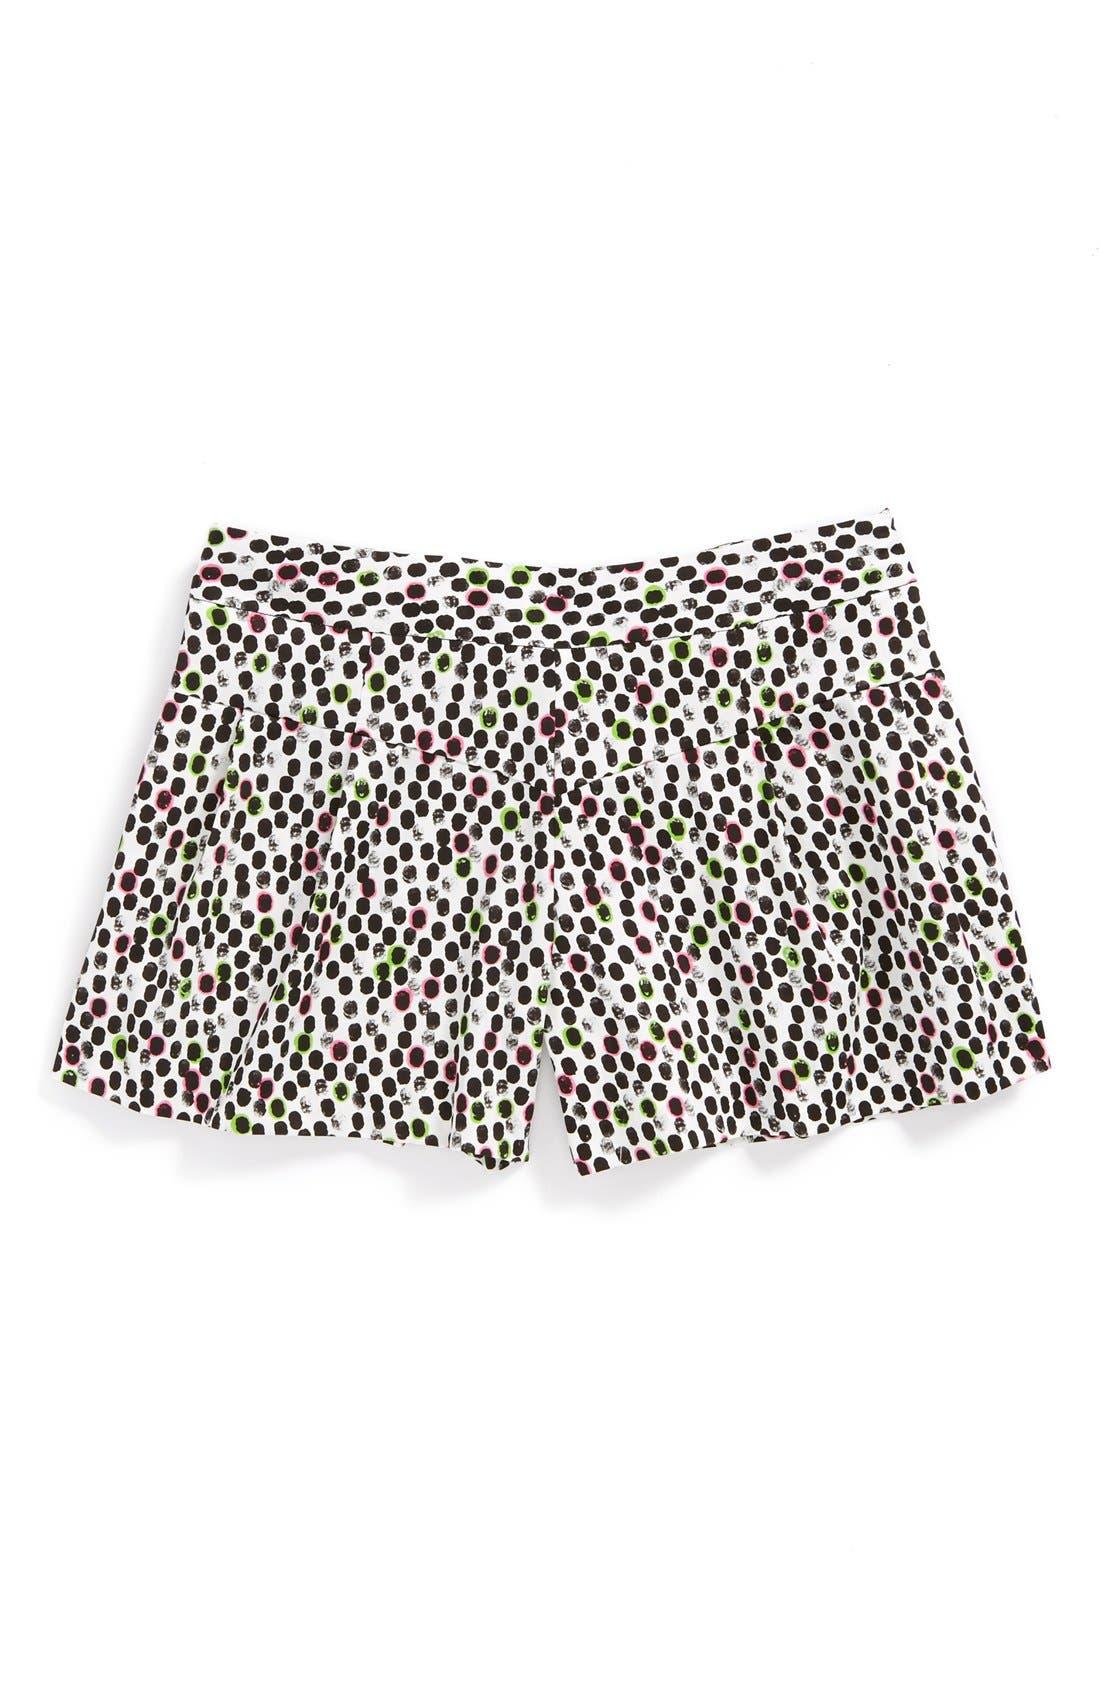 Alternate Image 1 Selected - Milly Minis 'Ocelot' Shorts (Big Girls)